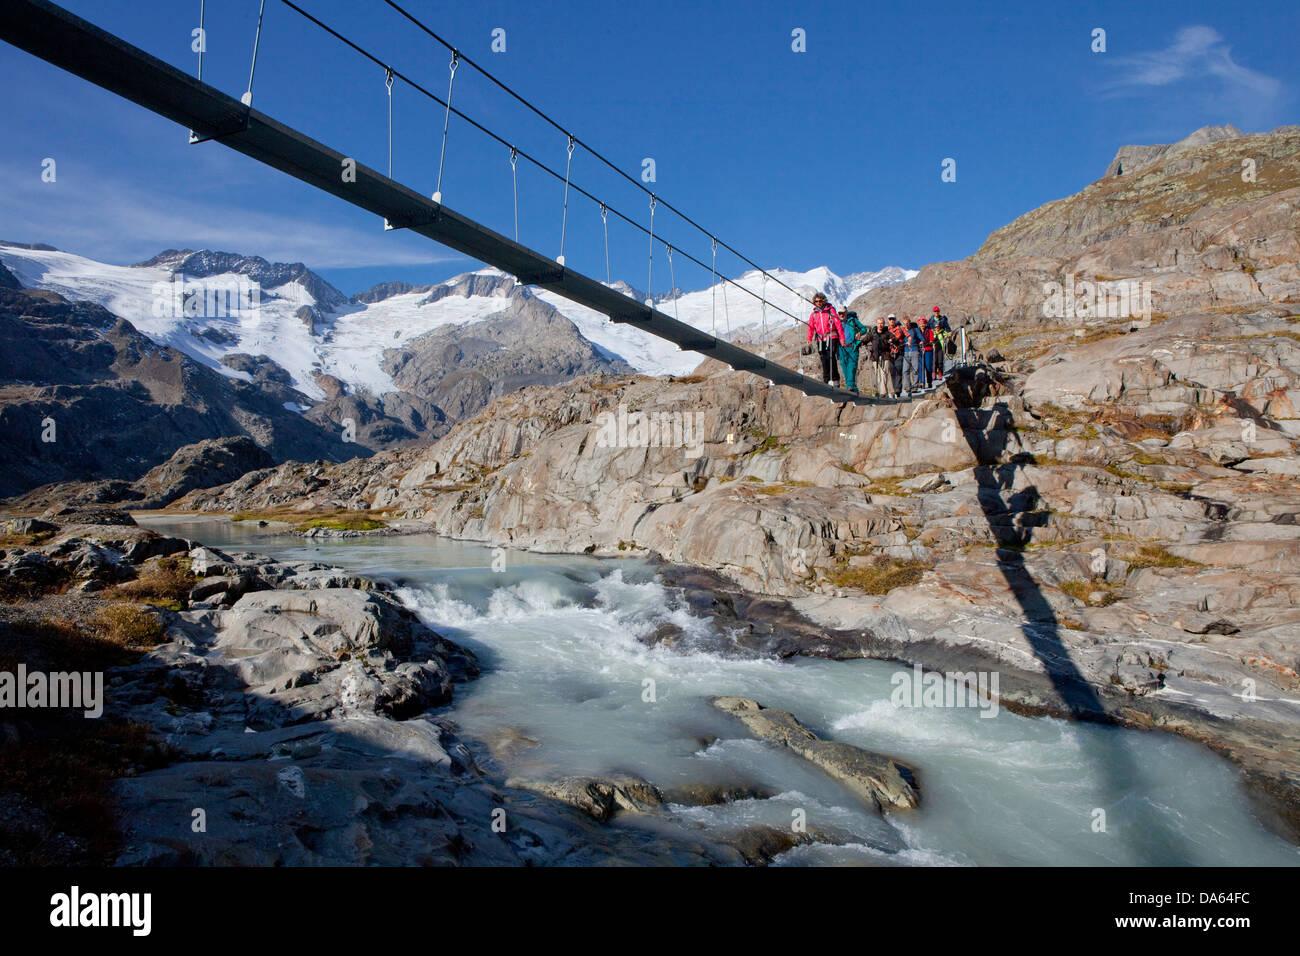 Traveller, Gauligletschersee, Urbachtal, mountain, mountains, canton, Bern, Gauli, Gauligebiet, Gauligletscher, - Stock Image